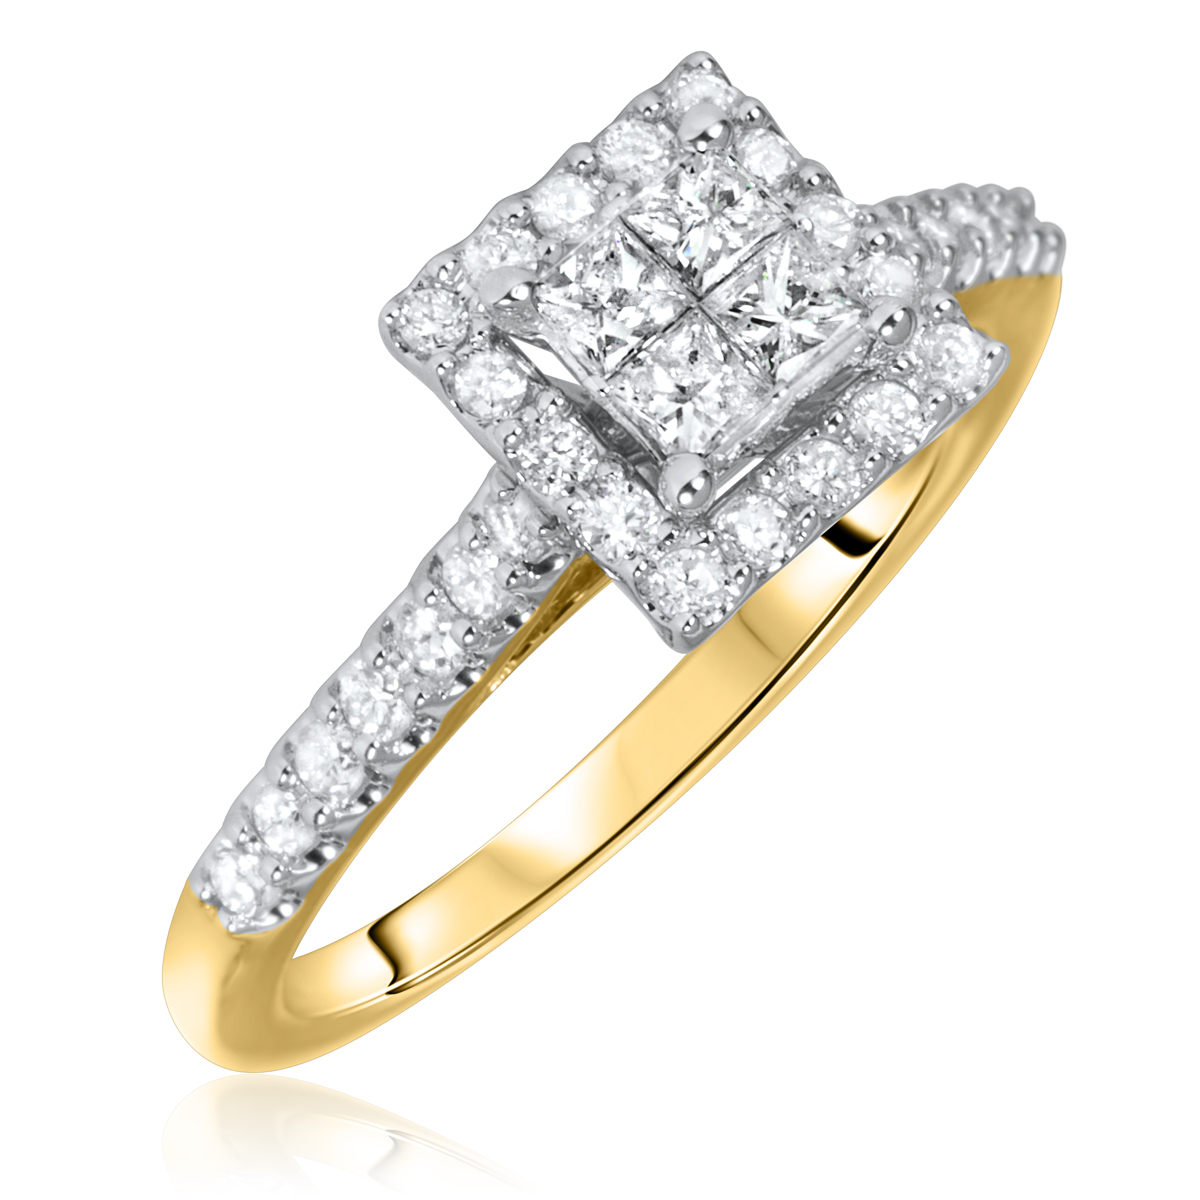 5/8 Carat T.W. Princess, Round Cut Diamond Ladies Engagement Ring 14K Yellow